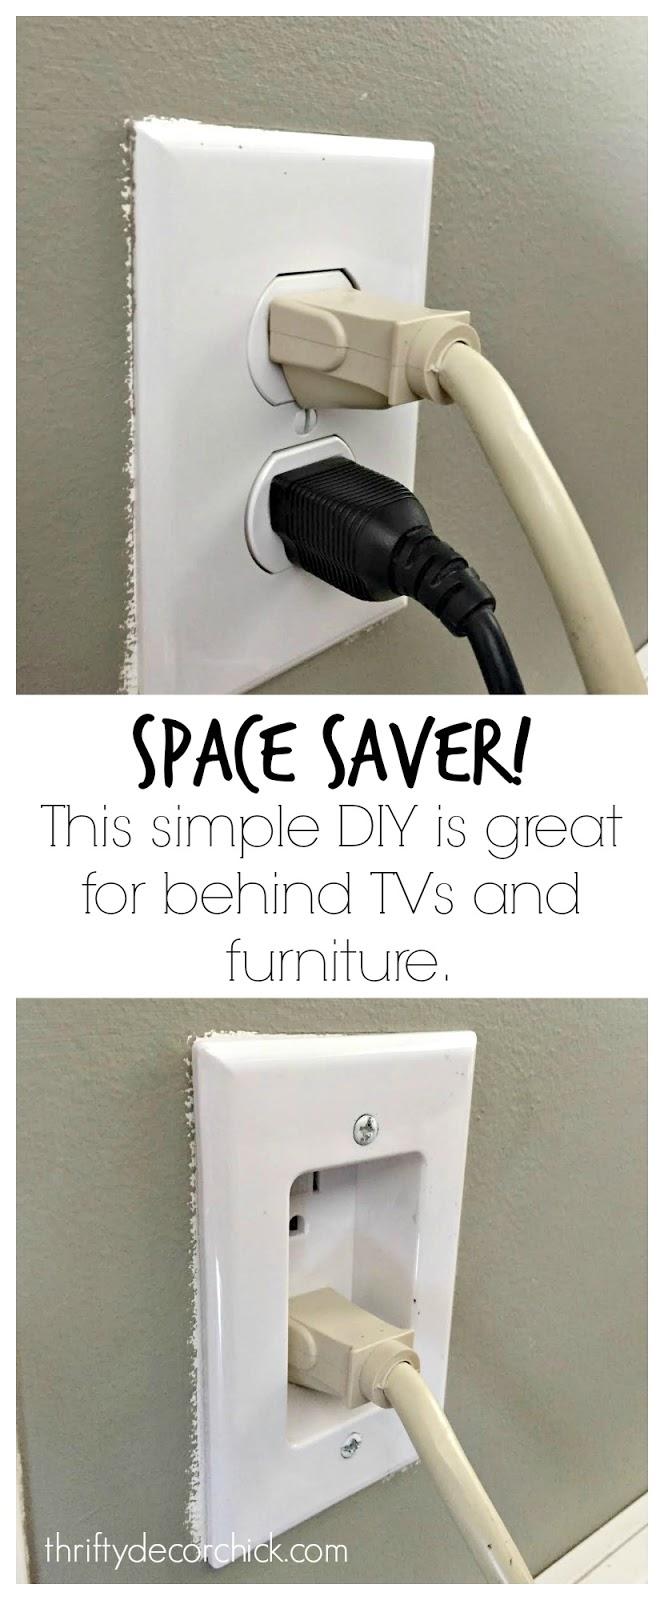 DIY: recessing a plug